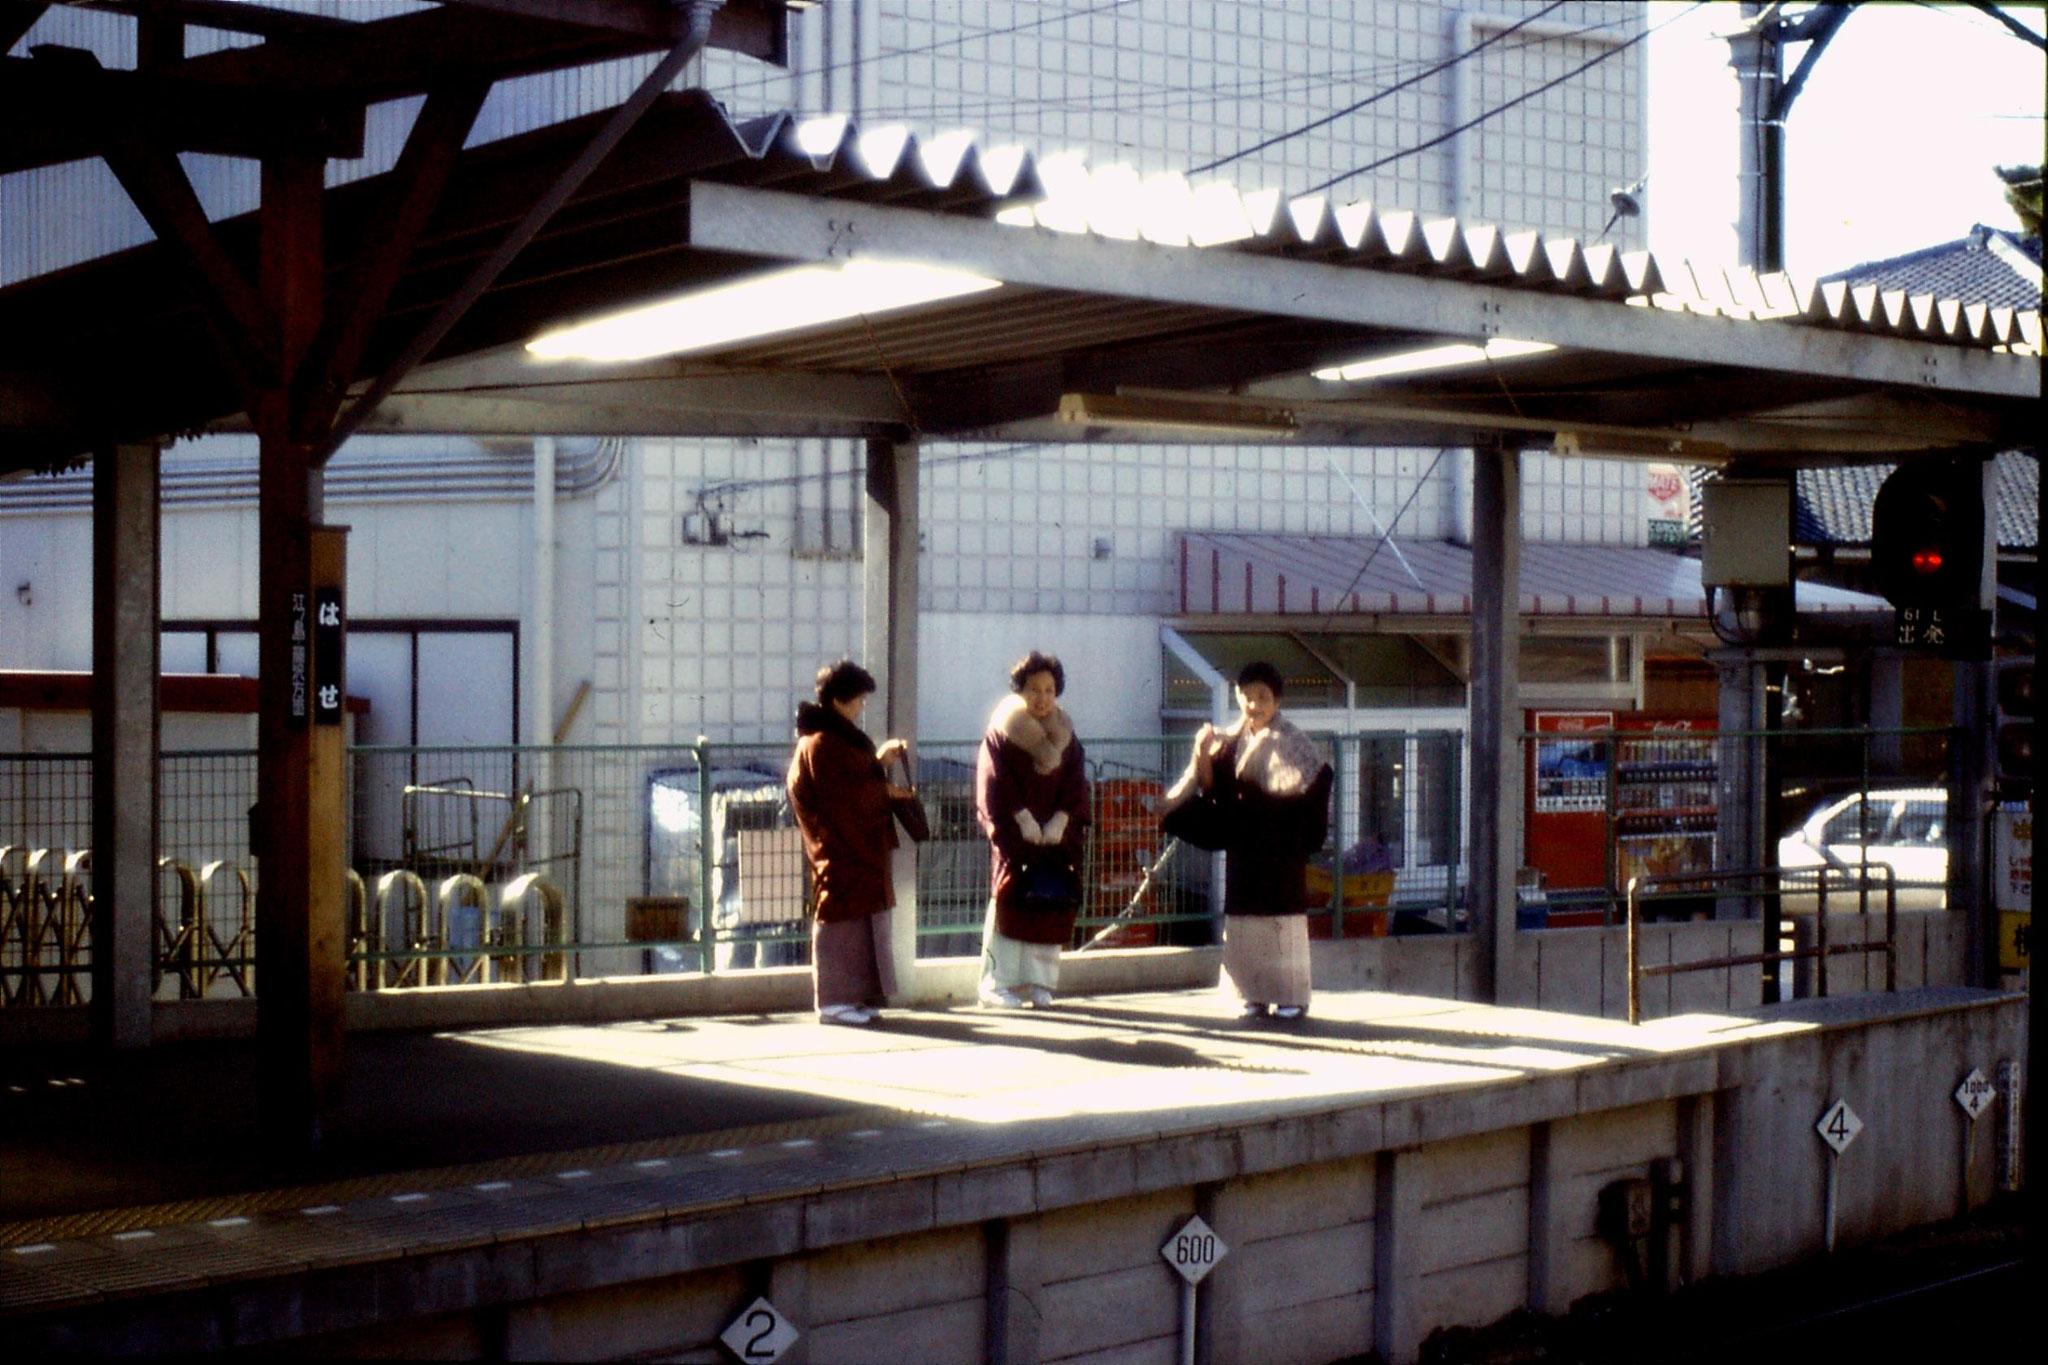 29/1/1989: 1: station platform Ken cho ji